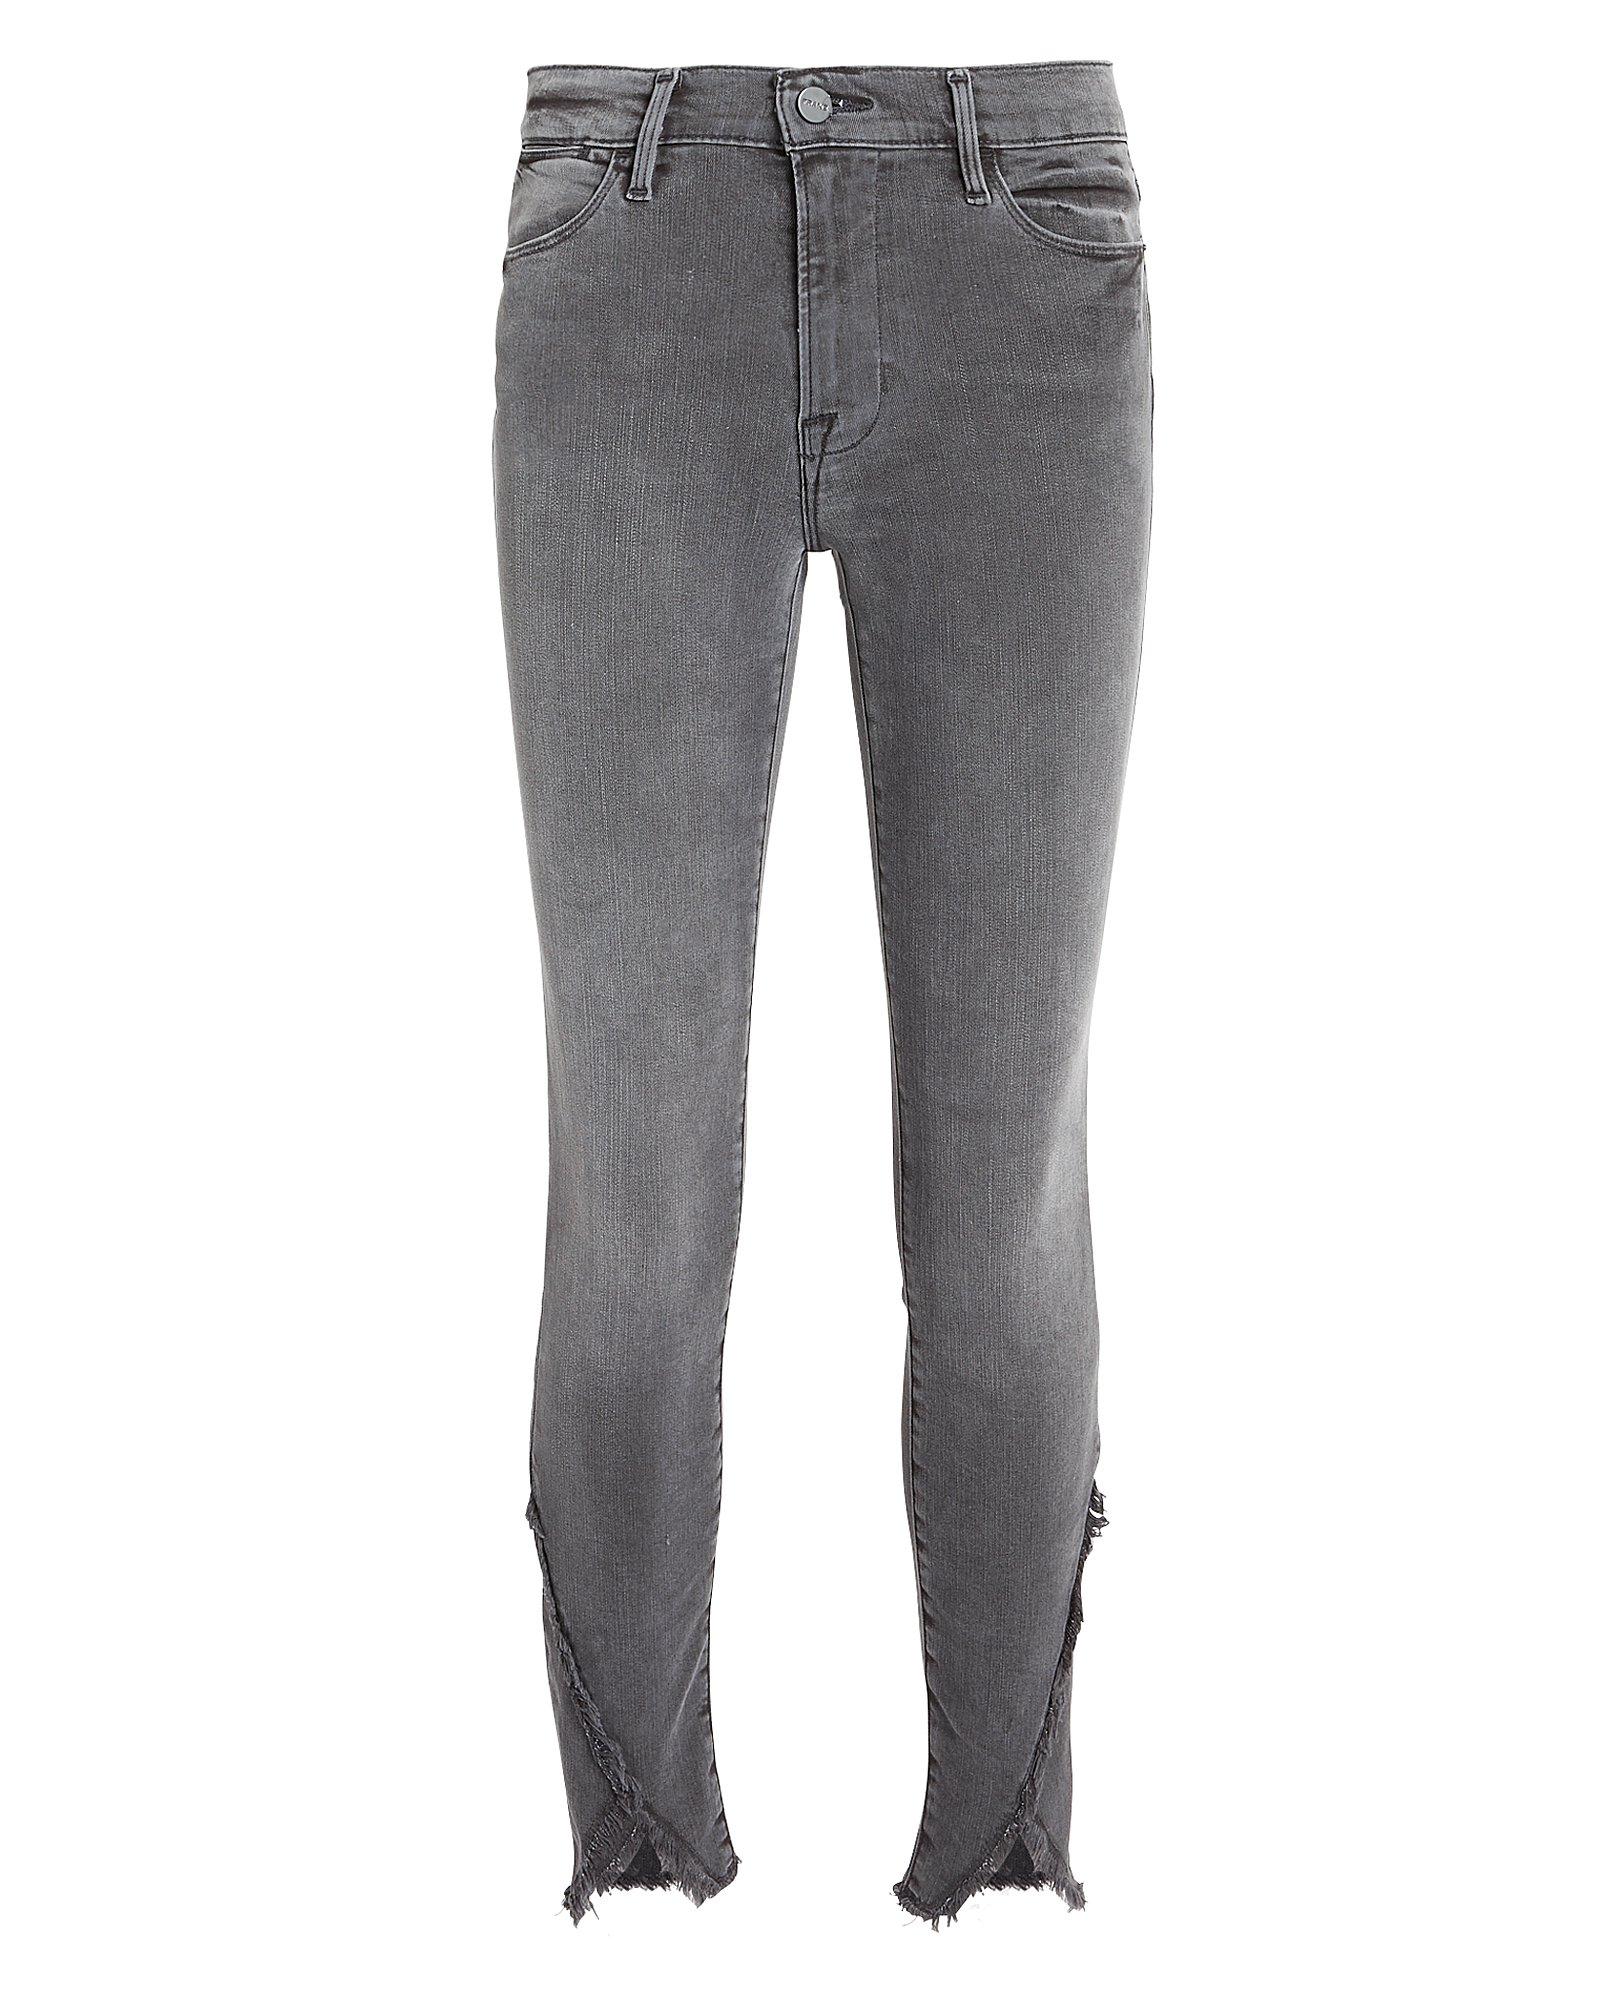 Quinby Asymmetrical Frayed Hem Jeans